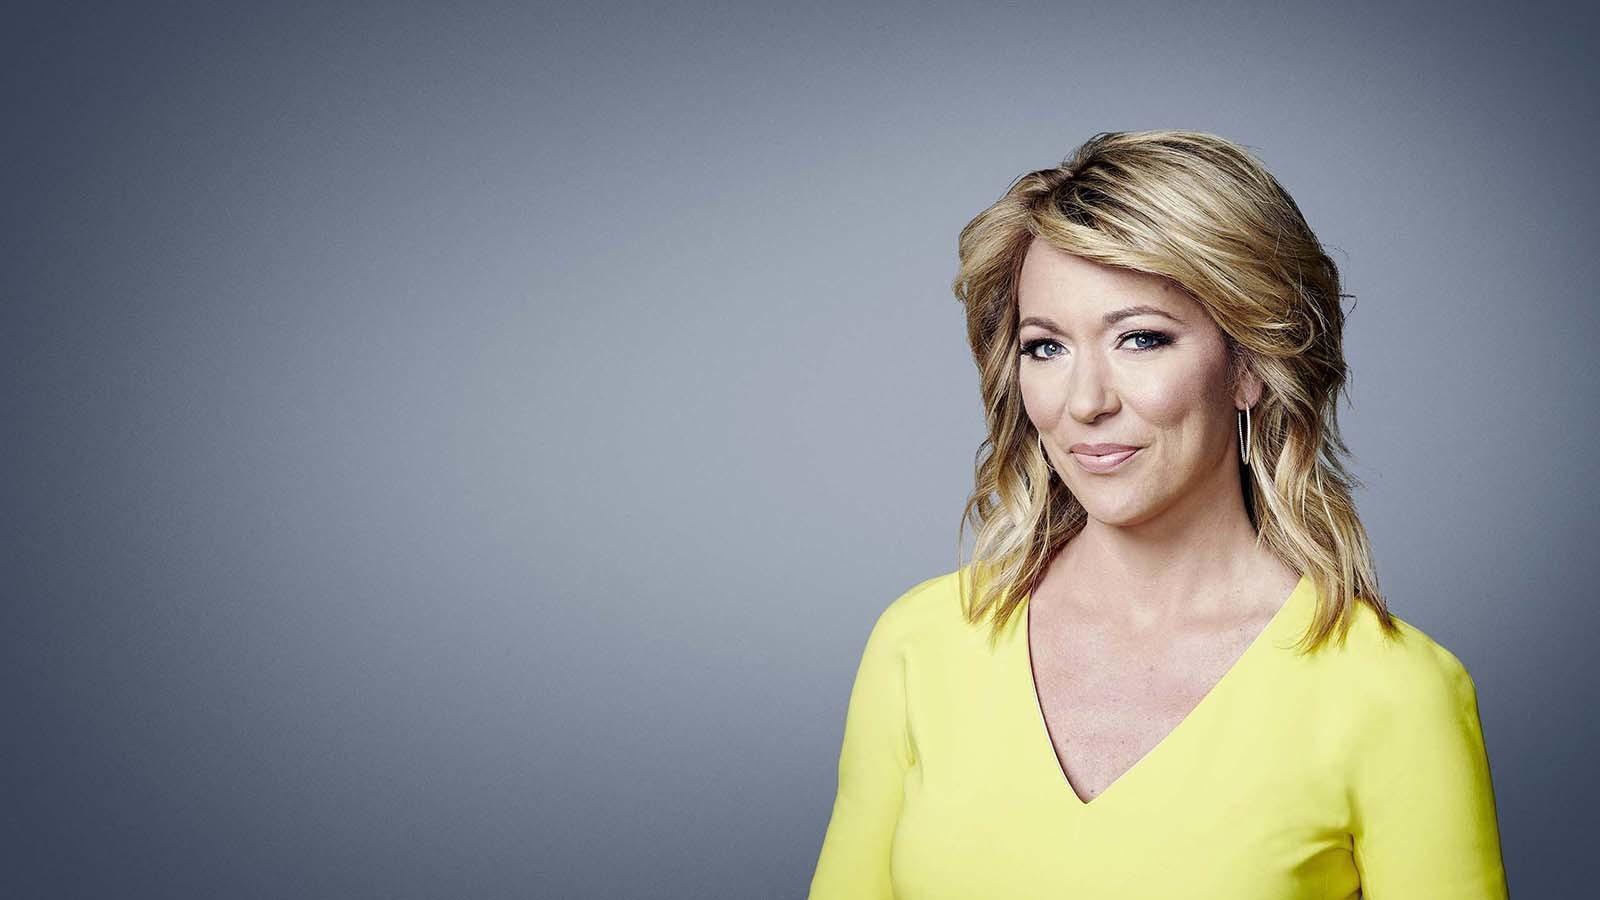 CNN Profiles - Brooke Baldwin - Anchor - CNN.com